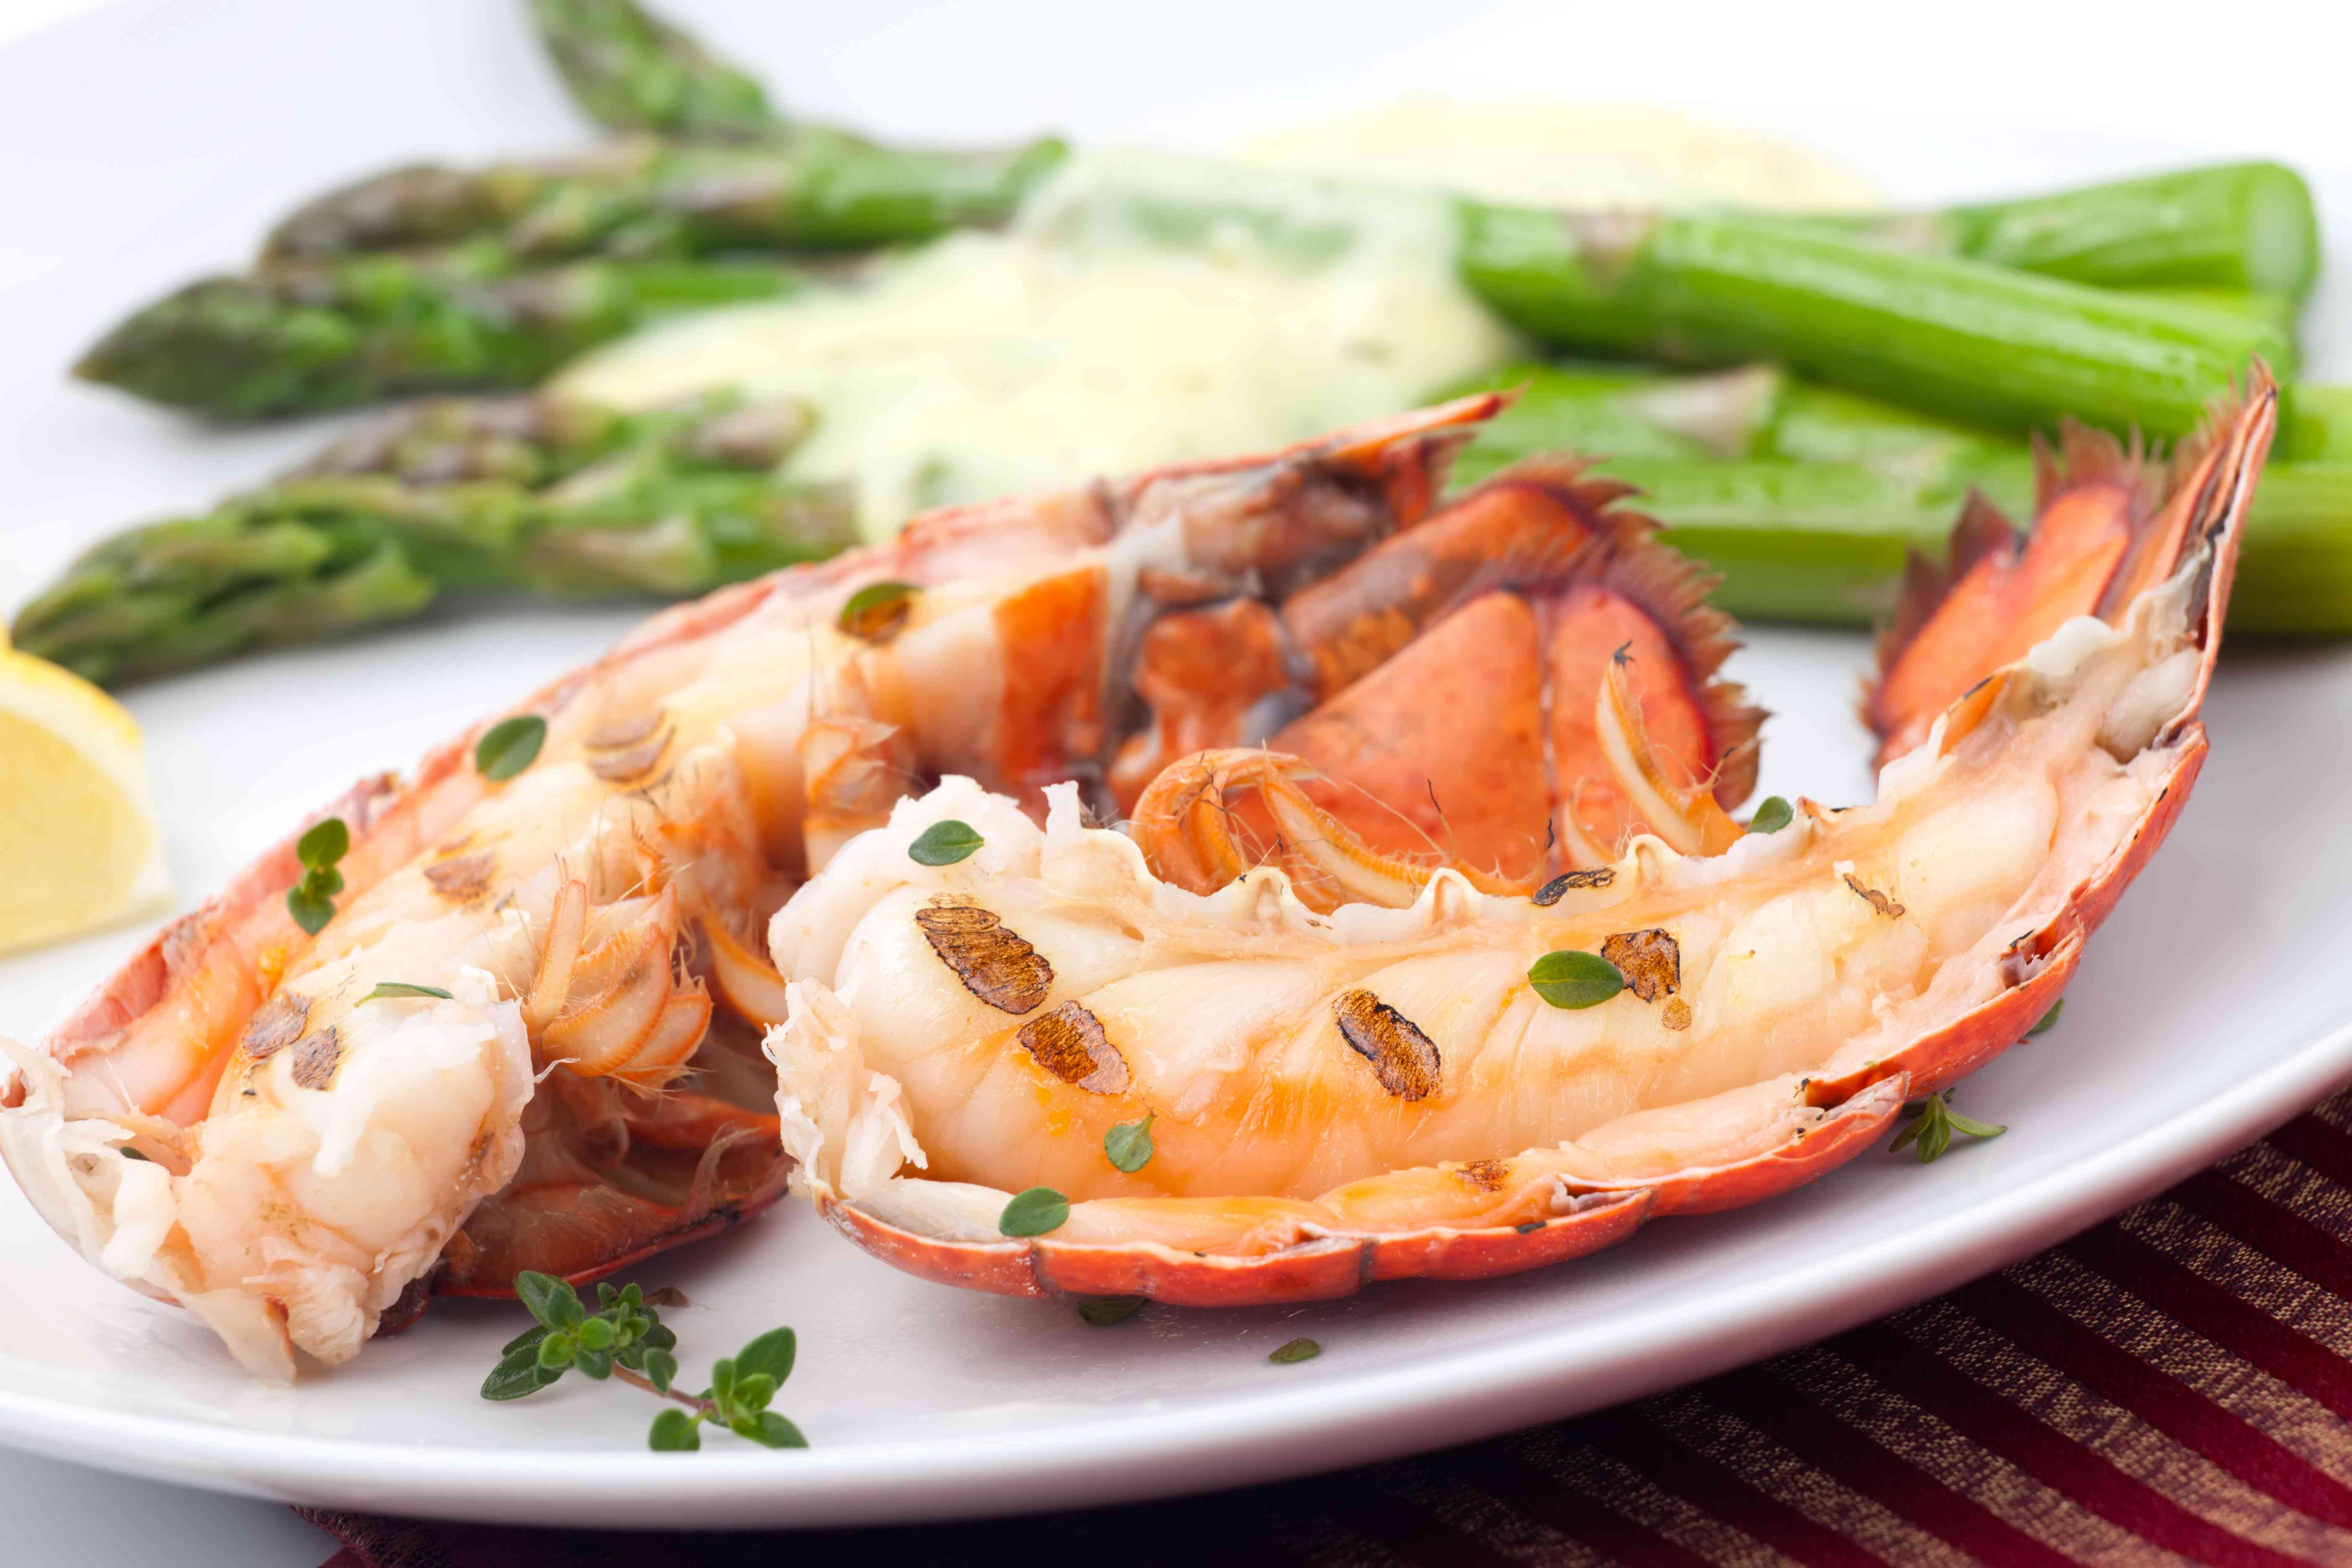 Lobster tail halves on a plate with asparagus